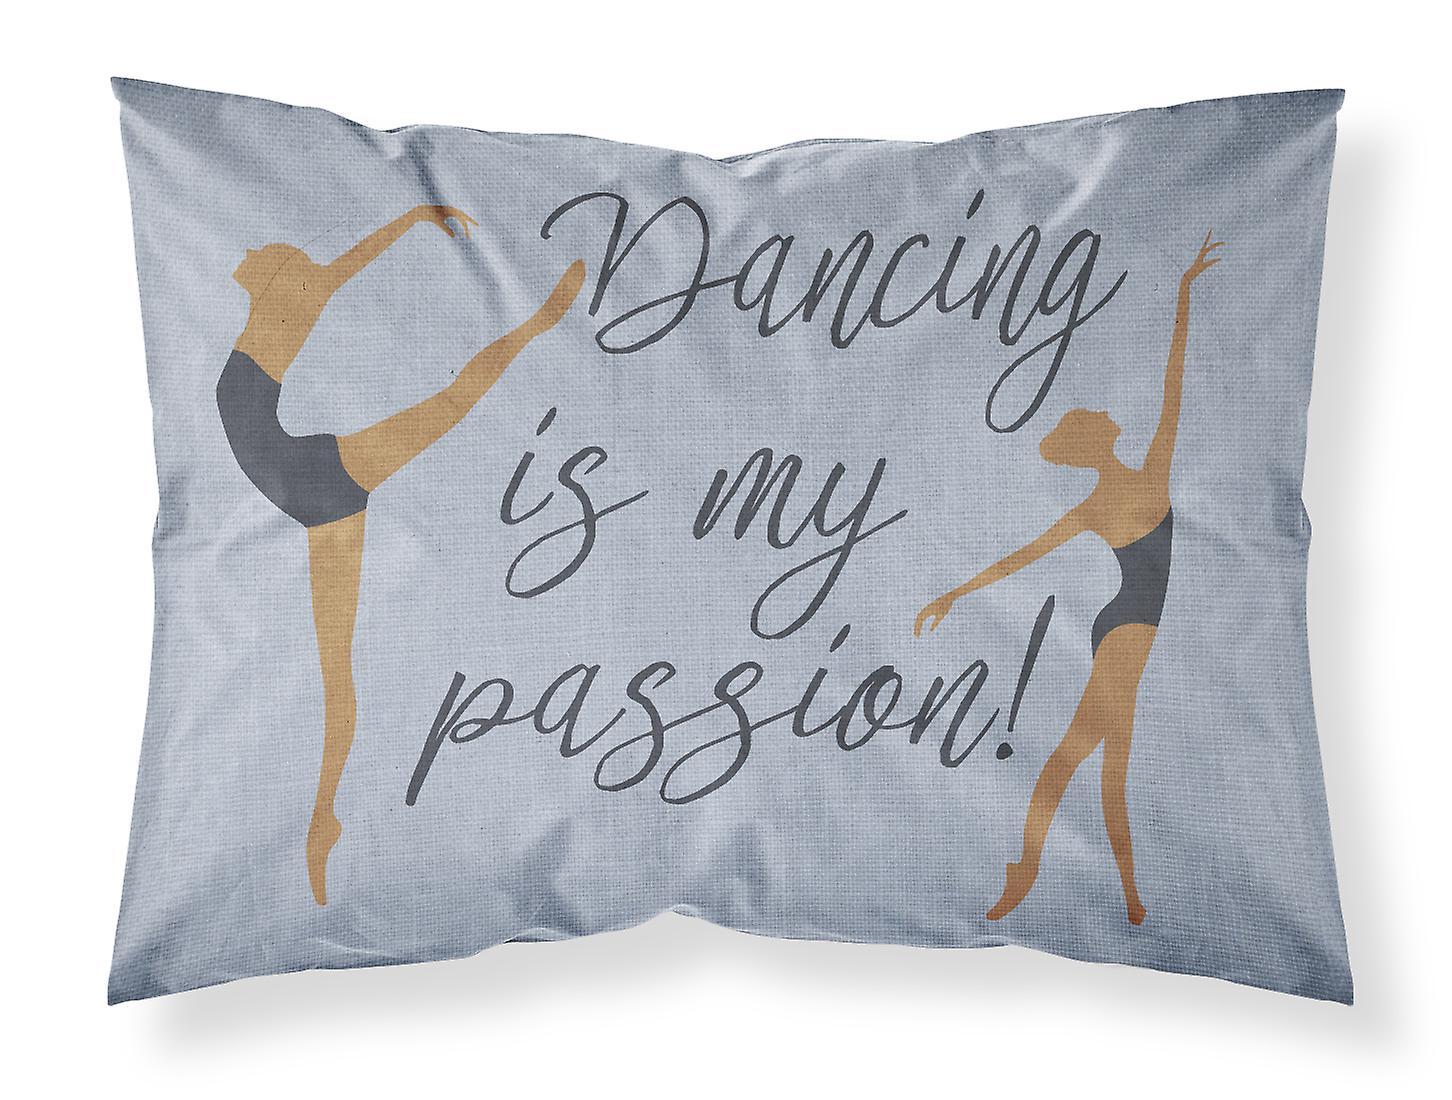 D'oreiller Danse La Passion Est Taie Ma Tissu Standard 7y6Ybfgv